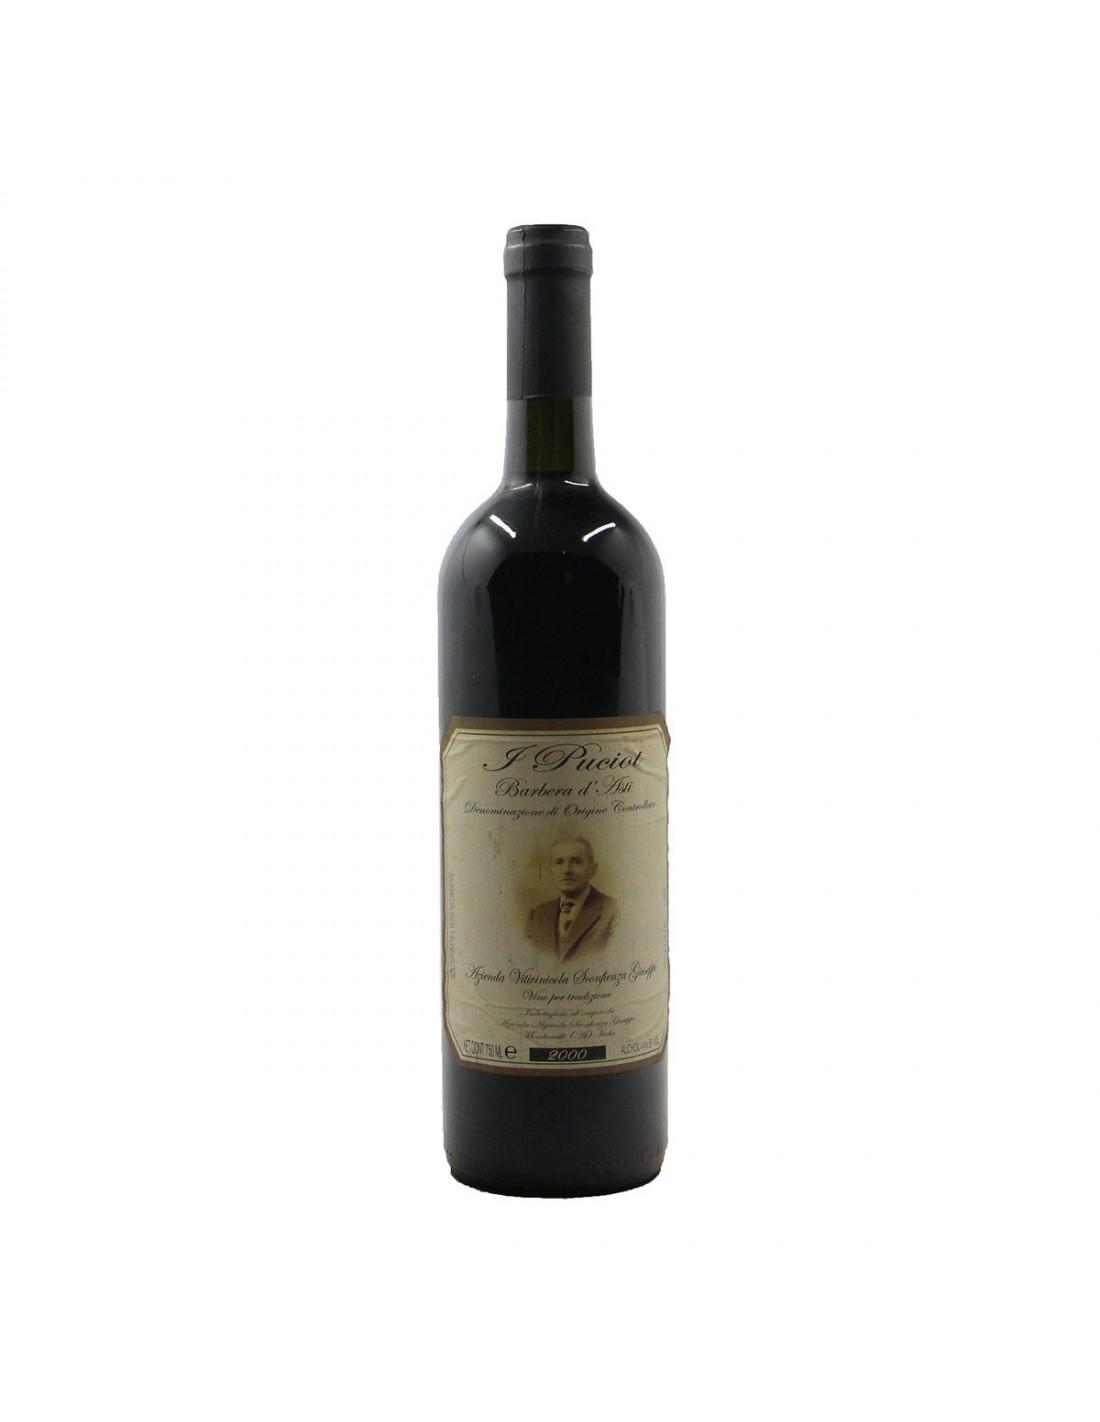 BARBERA ASTI 2000 SCONFIENZA Grandi Bottiglie